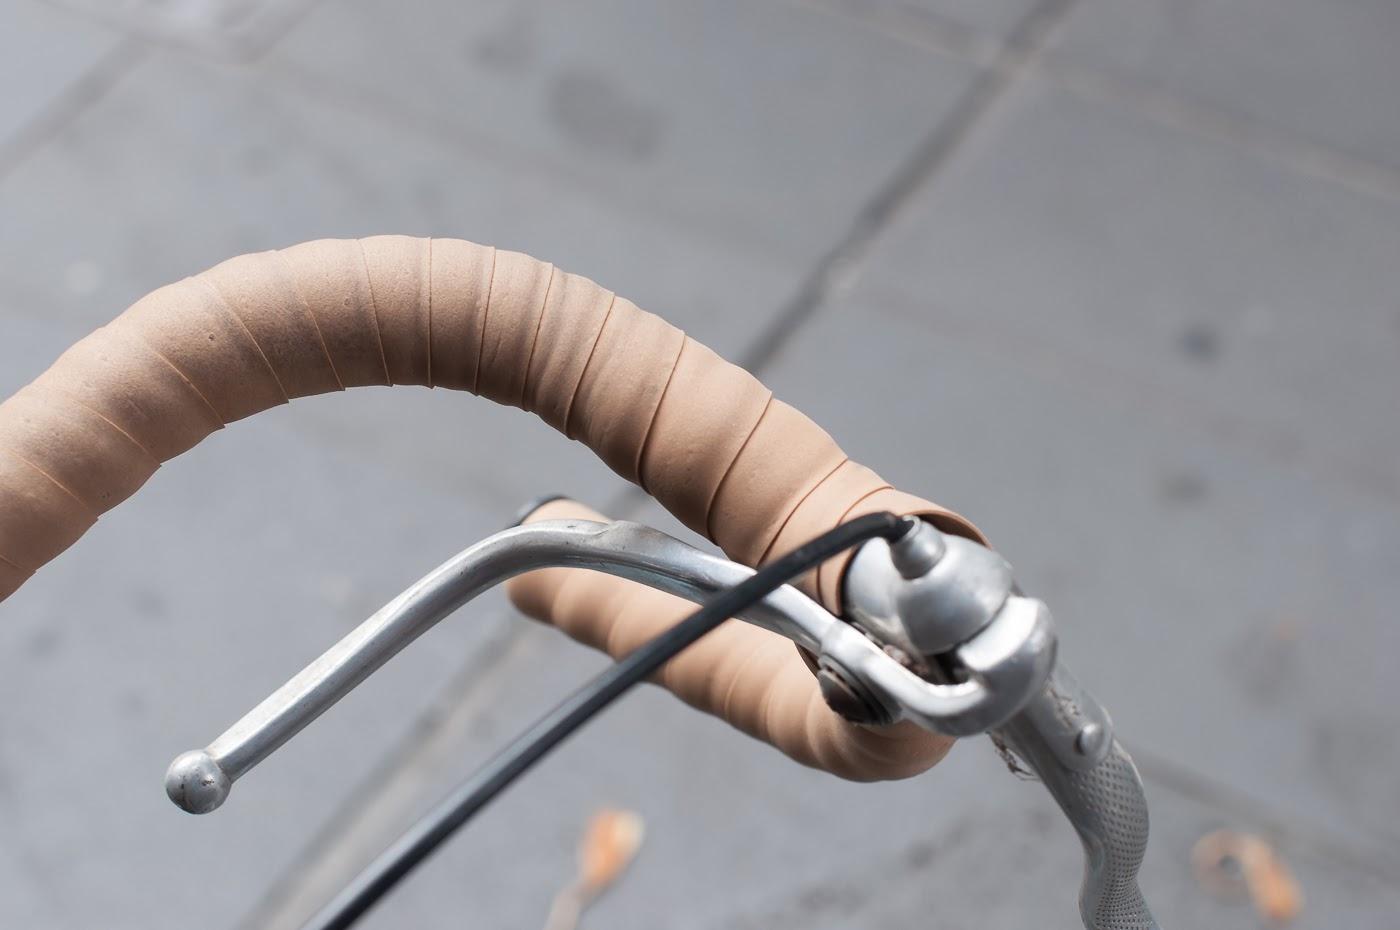 single speed, bike, bicycle, tim macauley, the biketorialist, melbourne, conversion, road bike,  bourke st, custom, brake lever, vintage, bar tape